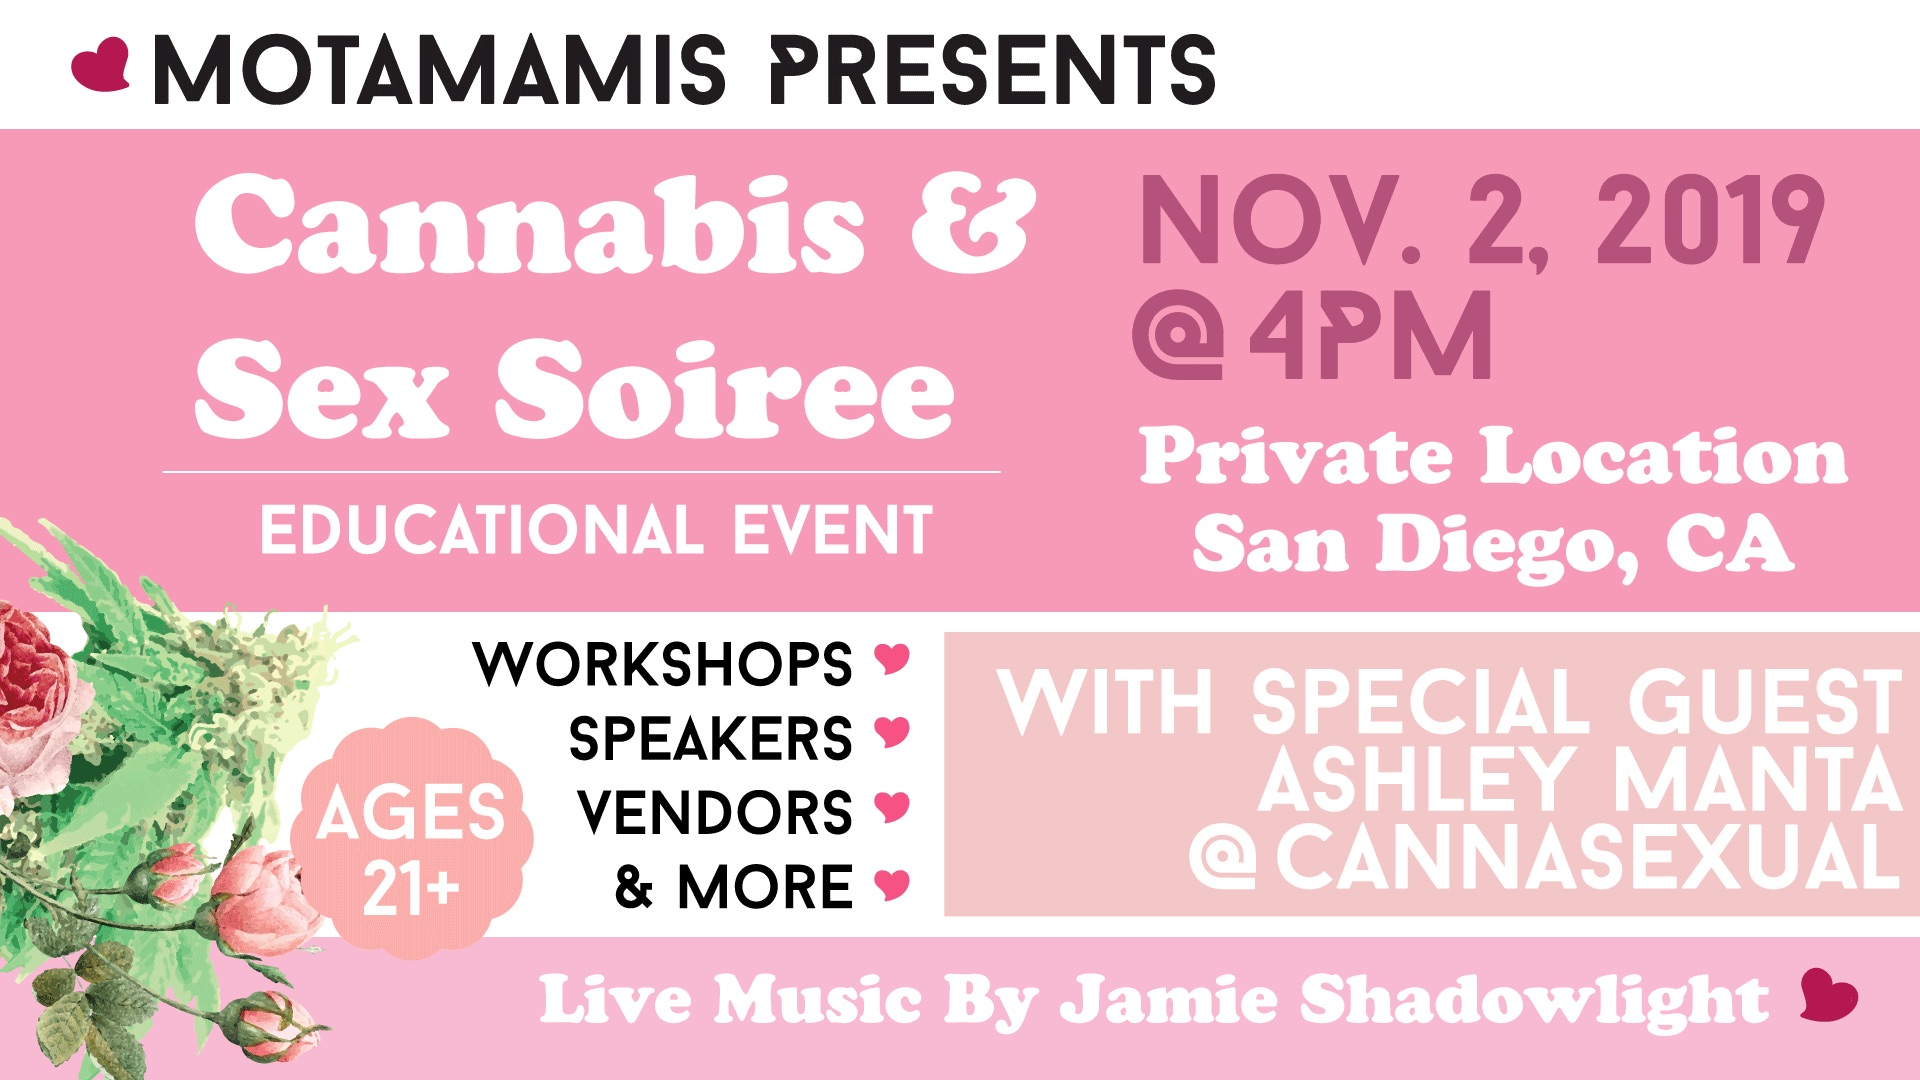 Cannabis & Sex Soirée